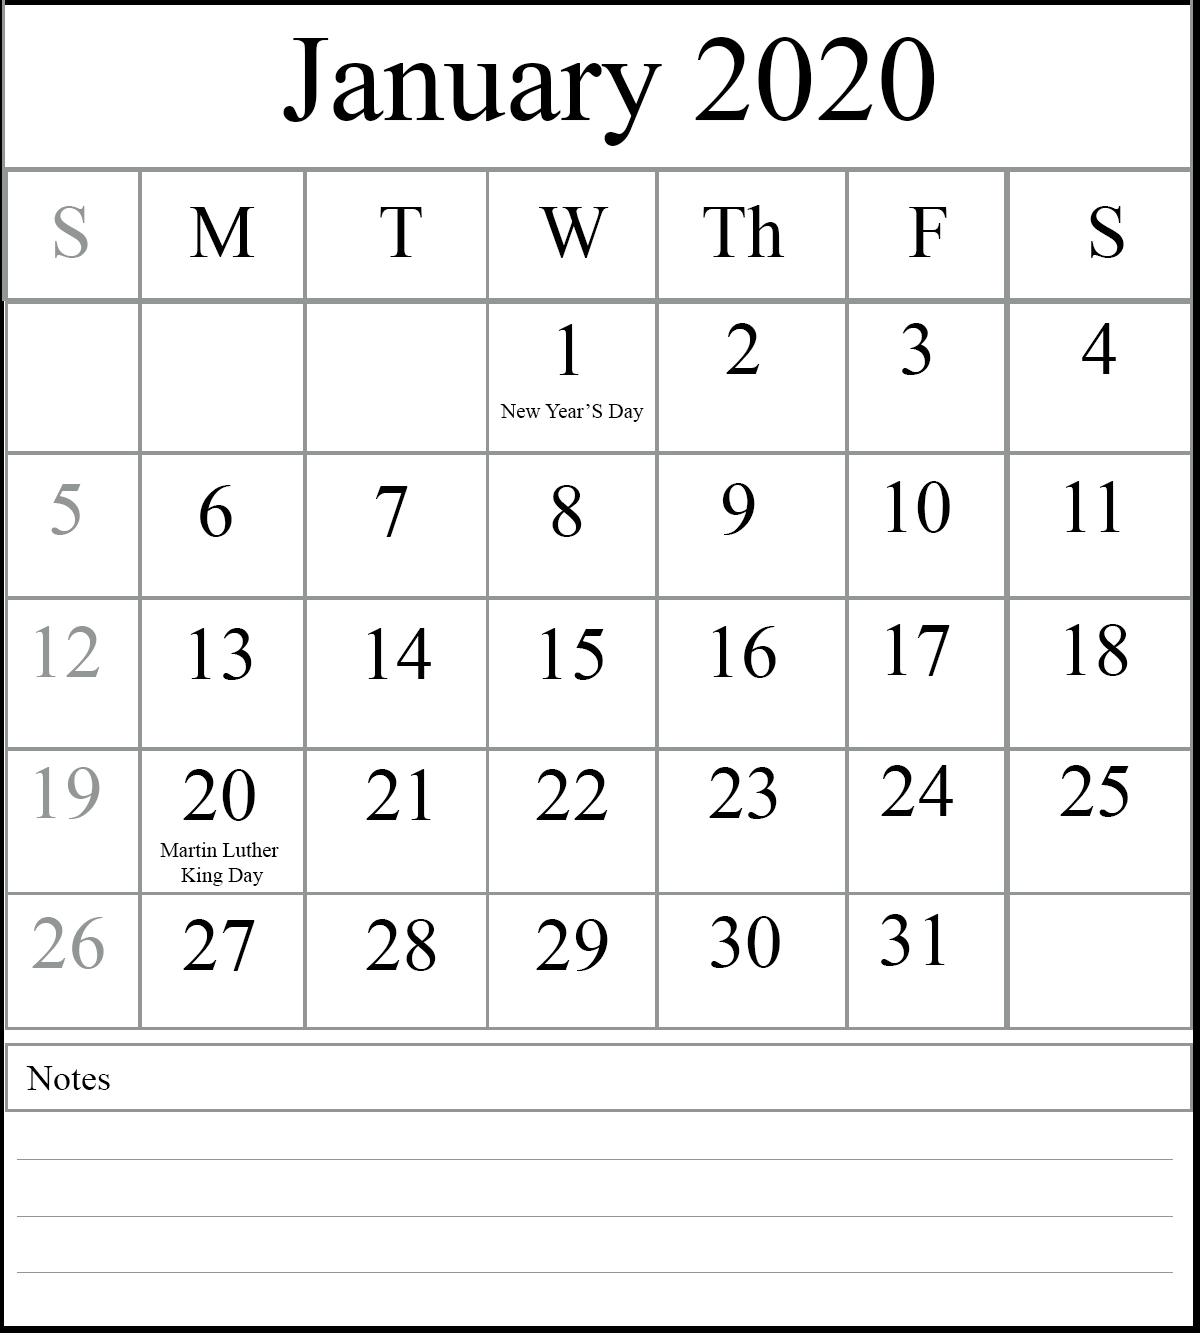 Free January 2020 Printable Calendar In Pdf, Excel & Word-January 2020 Calendar Xl